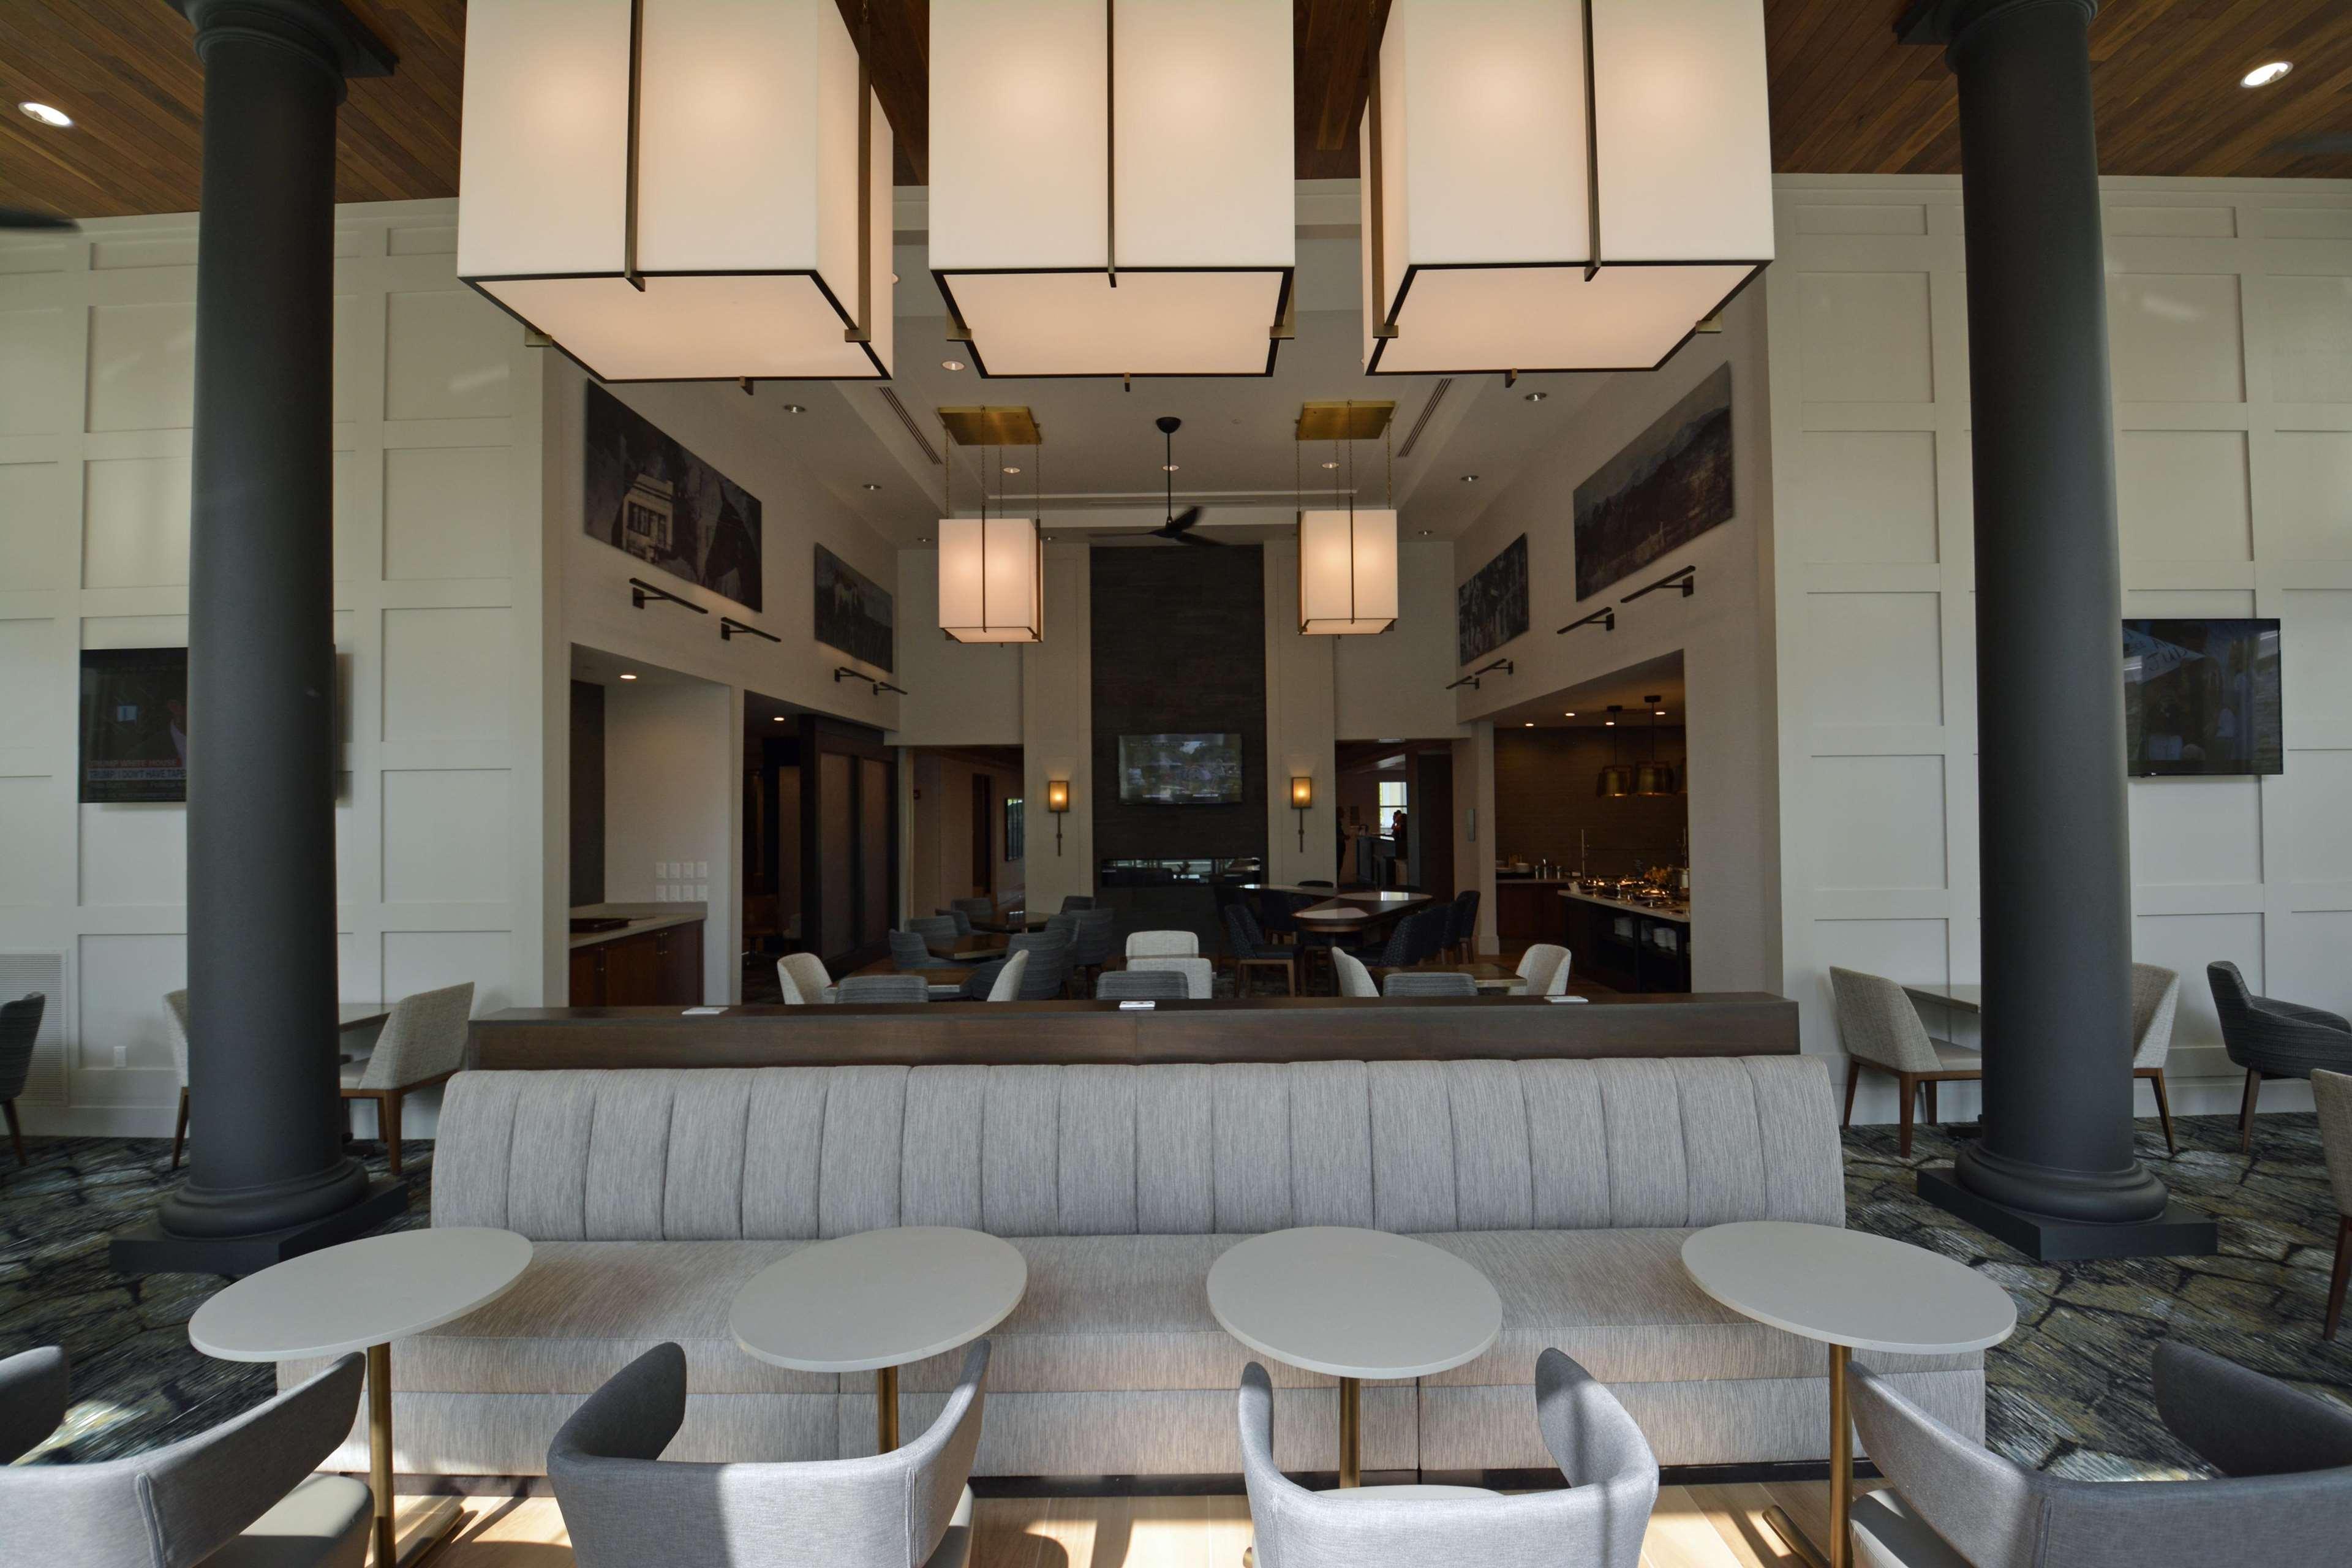 Homewood Suites by Hilton Saratoga Springs image 11